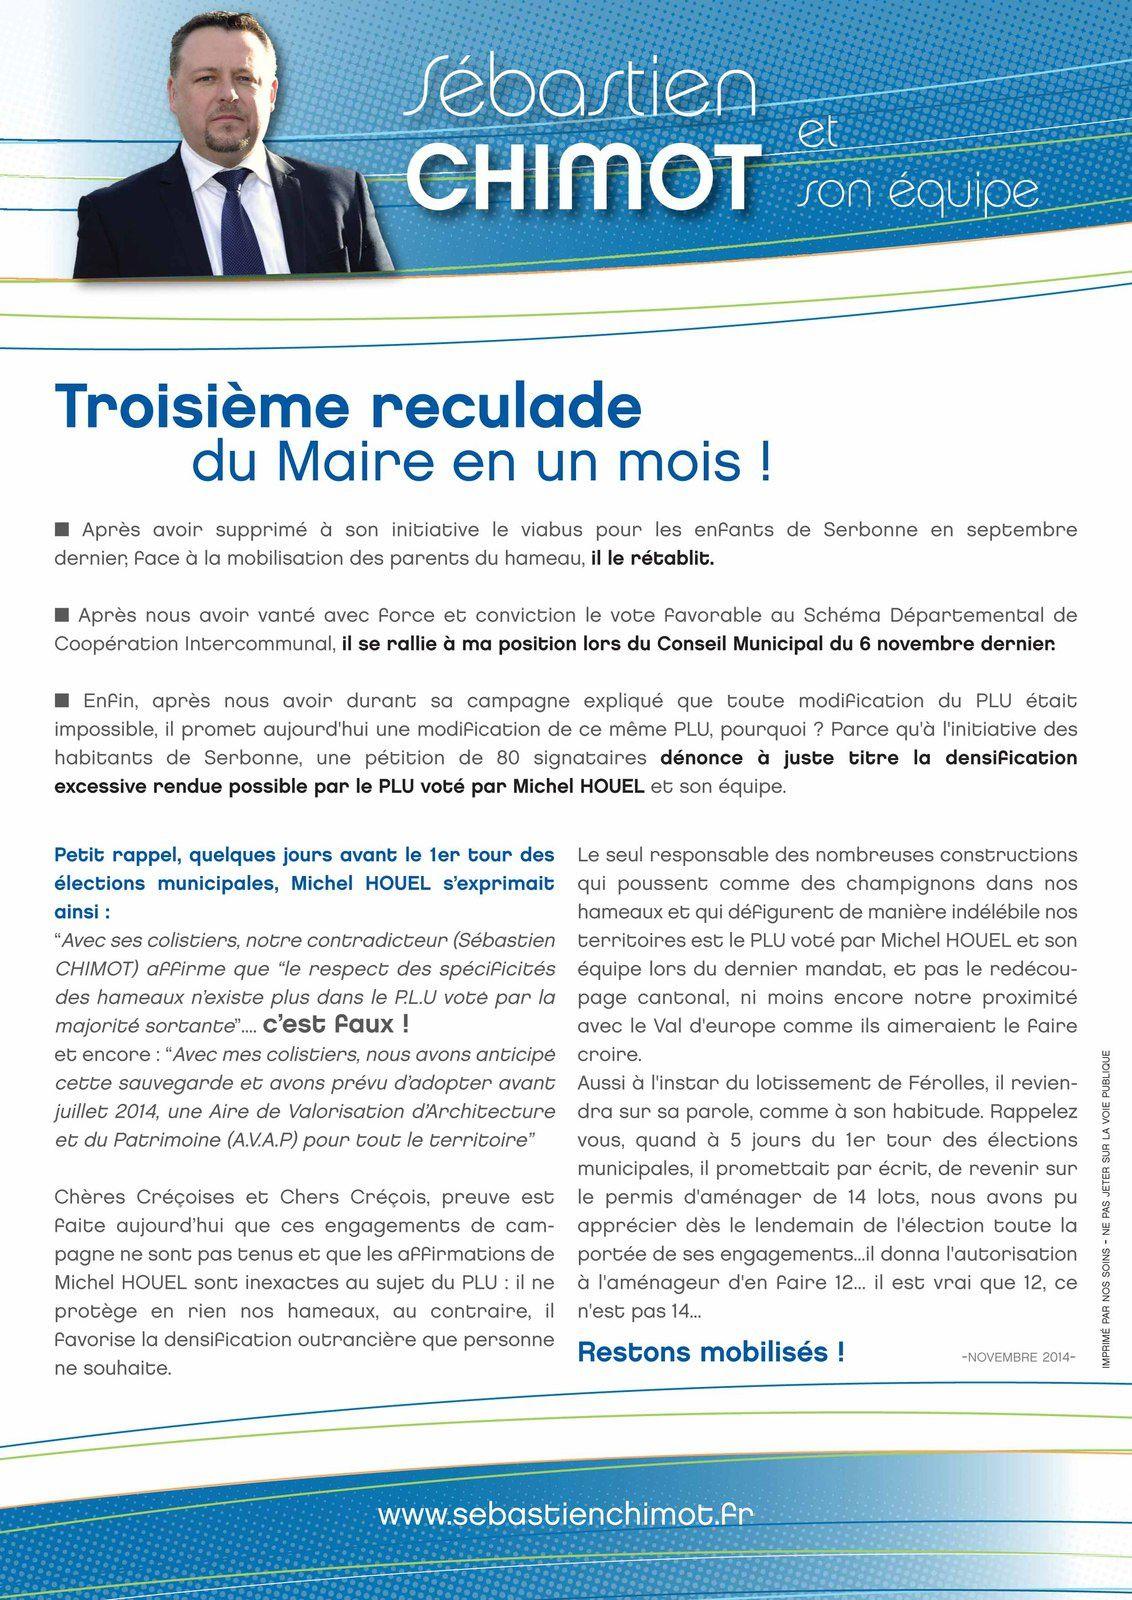 Troisième reculade de Michel HOUEL : le tract !